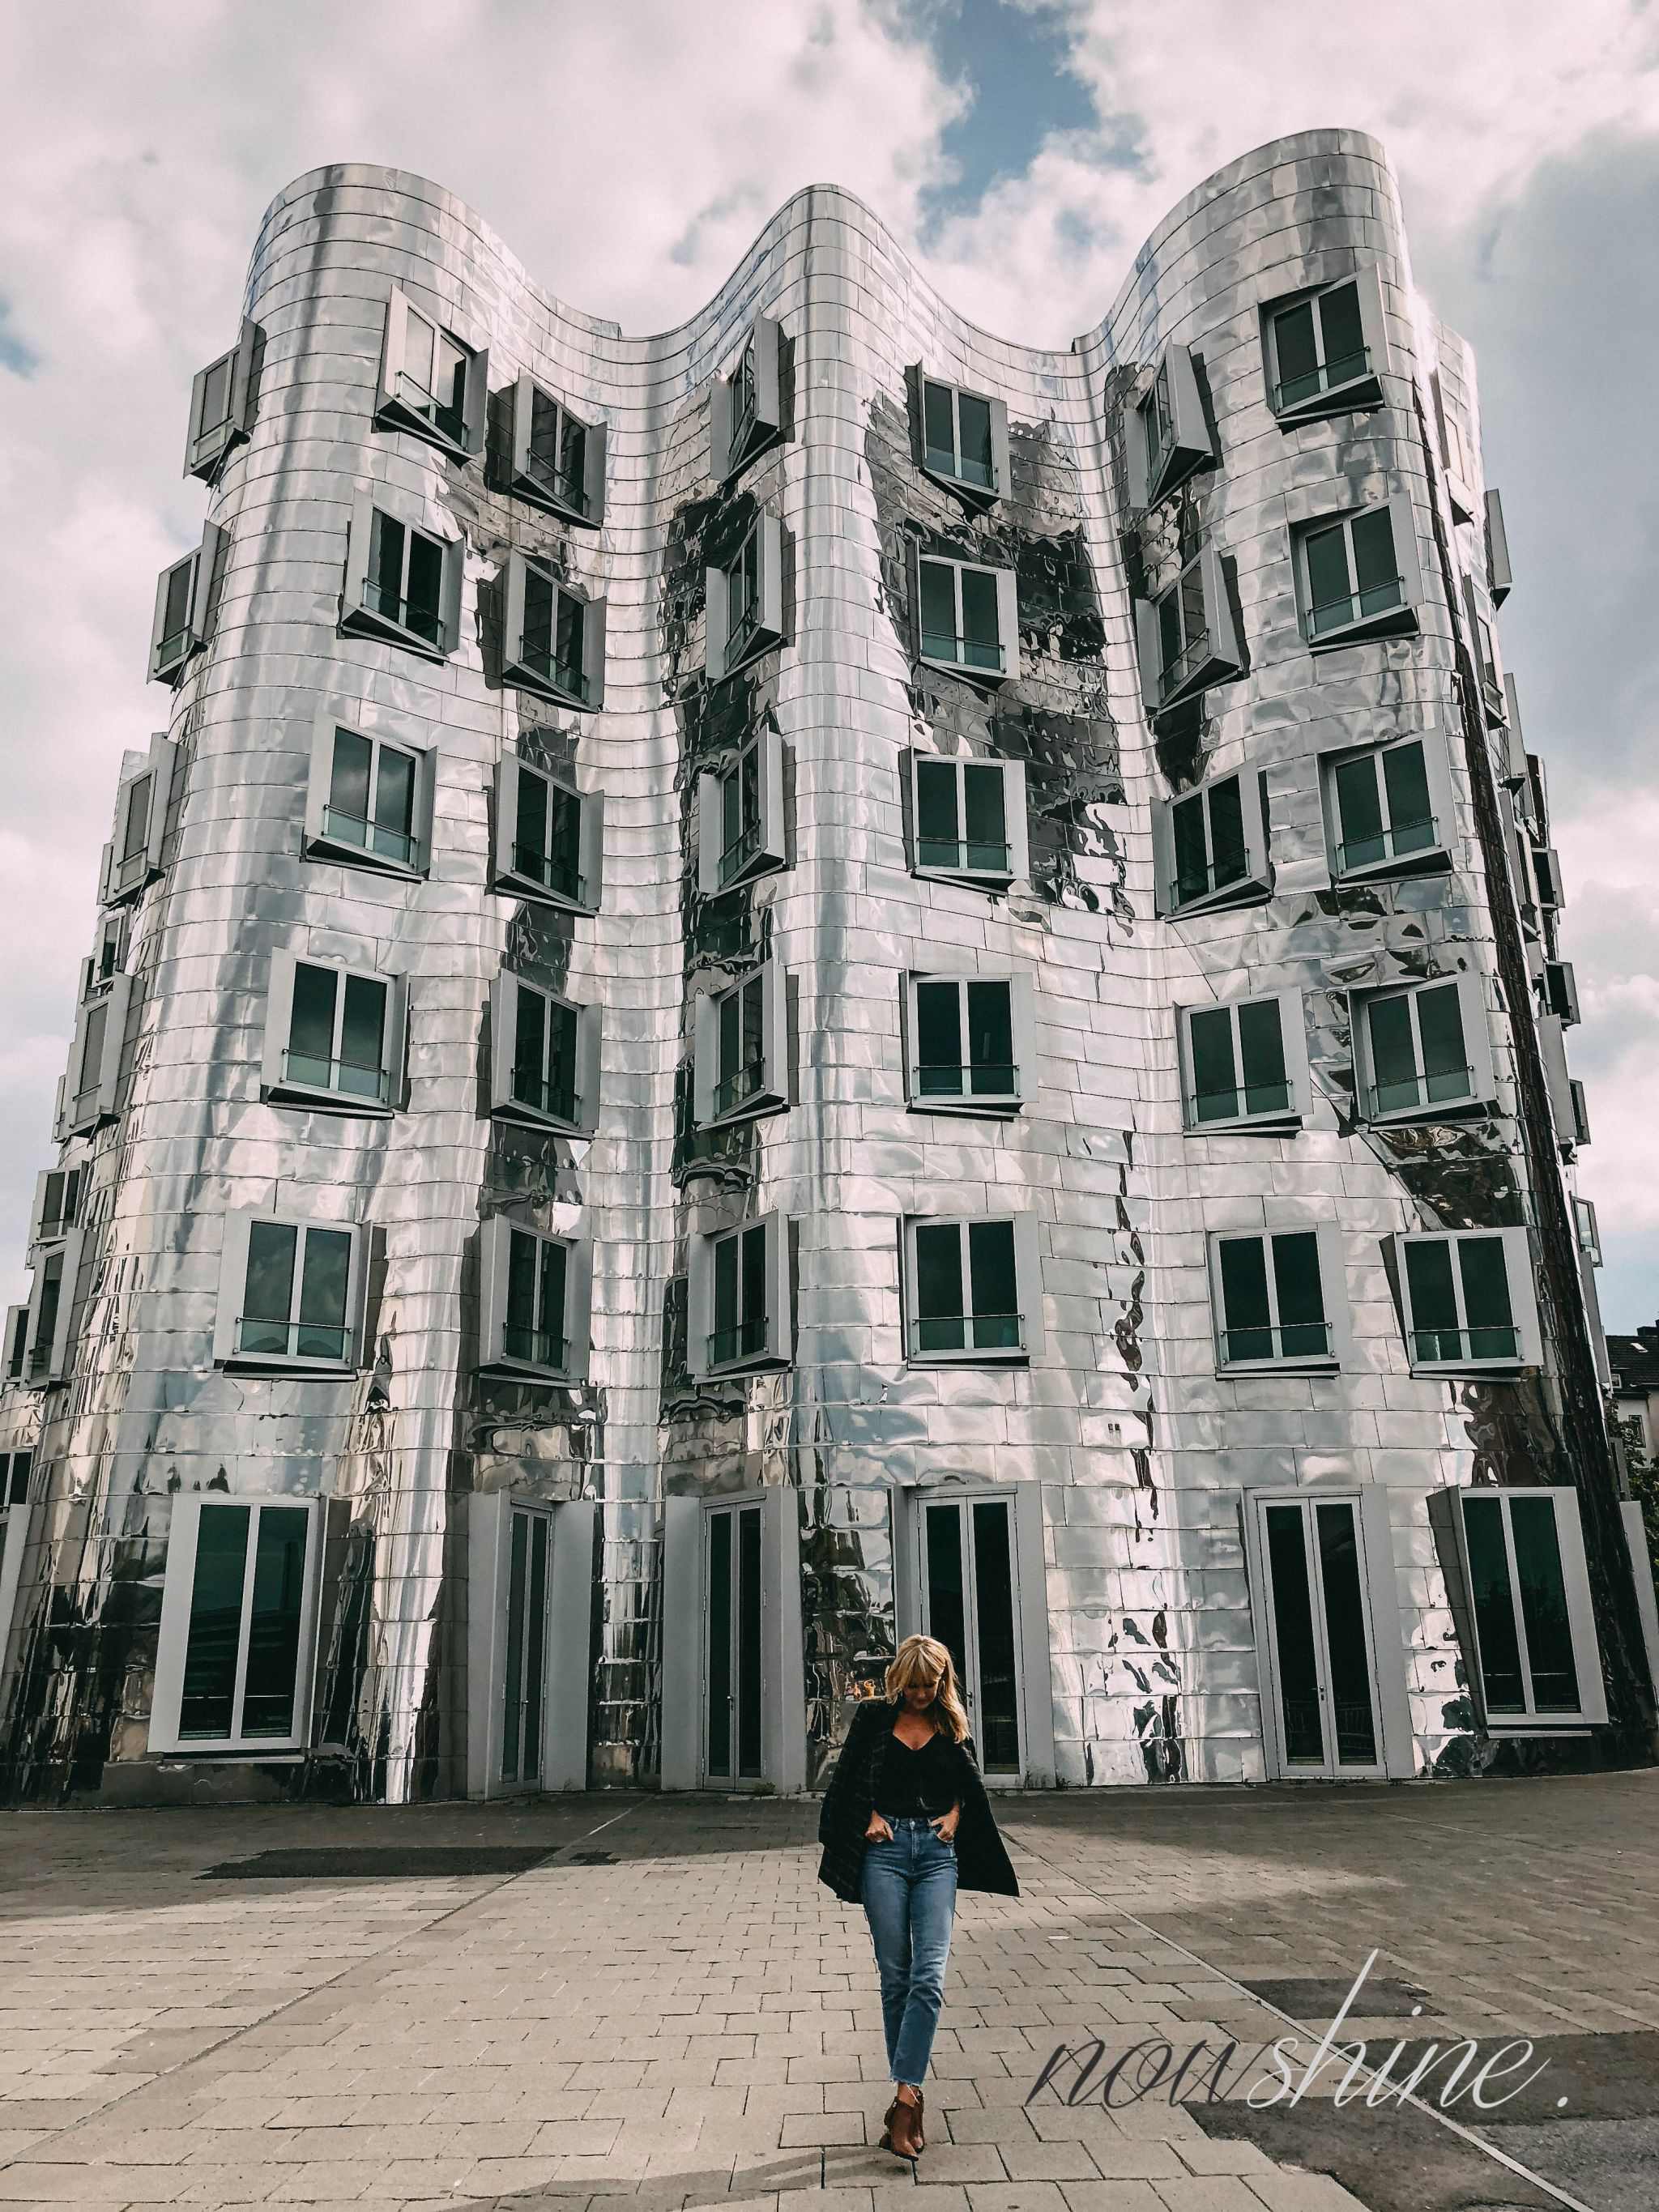 Defense Line von Paula´s Choice - Nowshine Beauty ü40 - my life, my city, my skin Kampagne - Gehry Bauten Düsseldorf